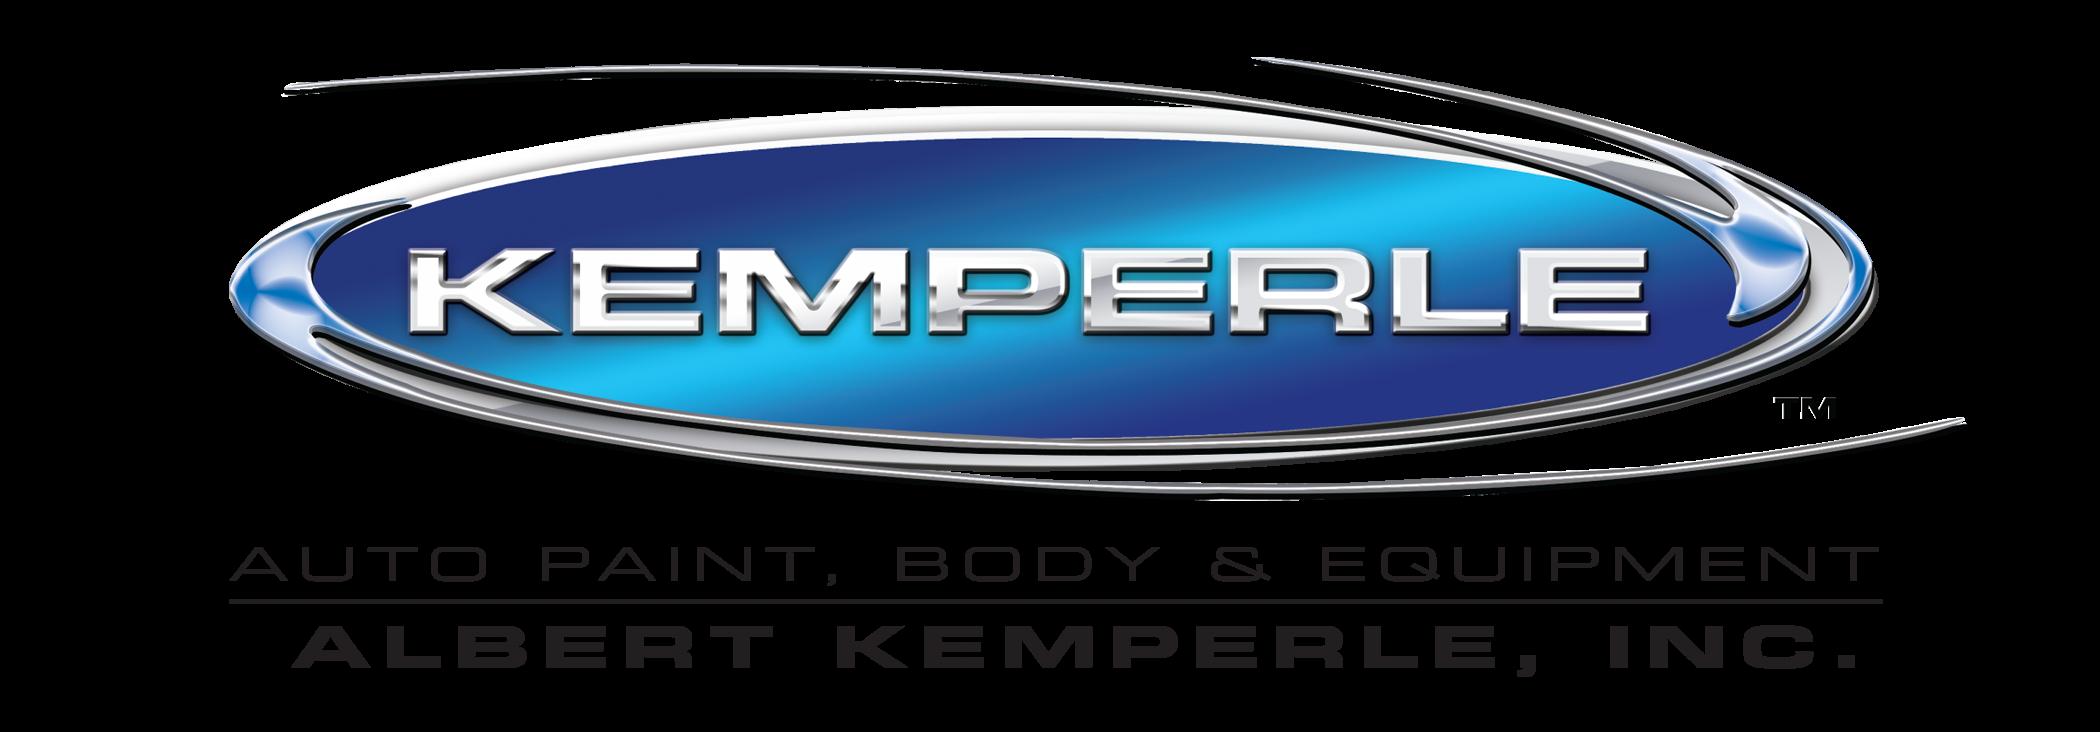 Kemperle.png